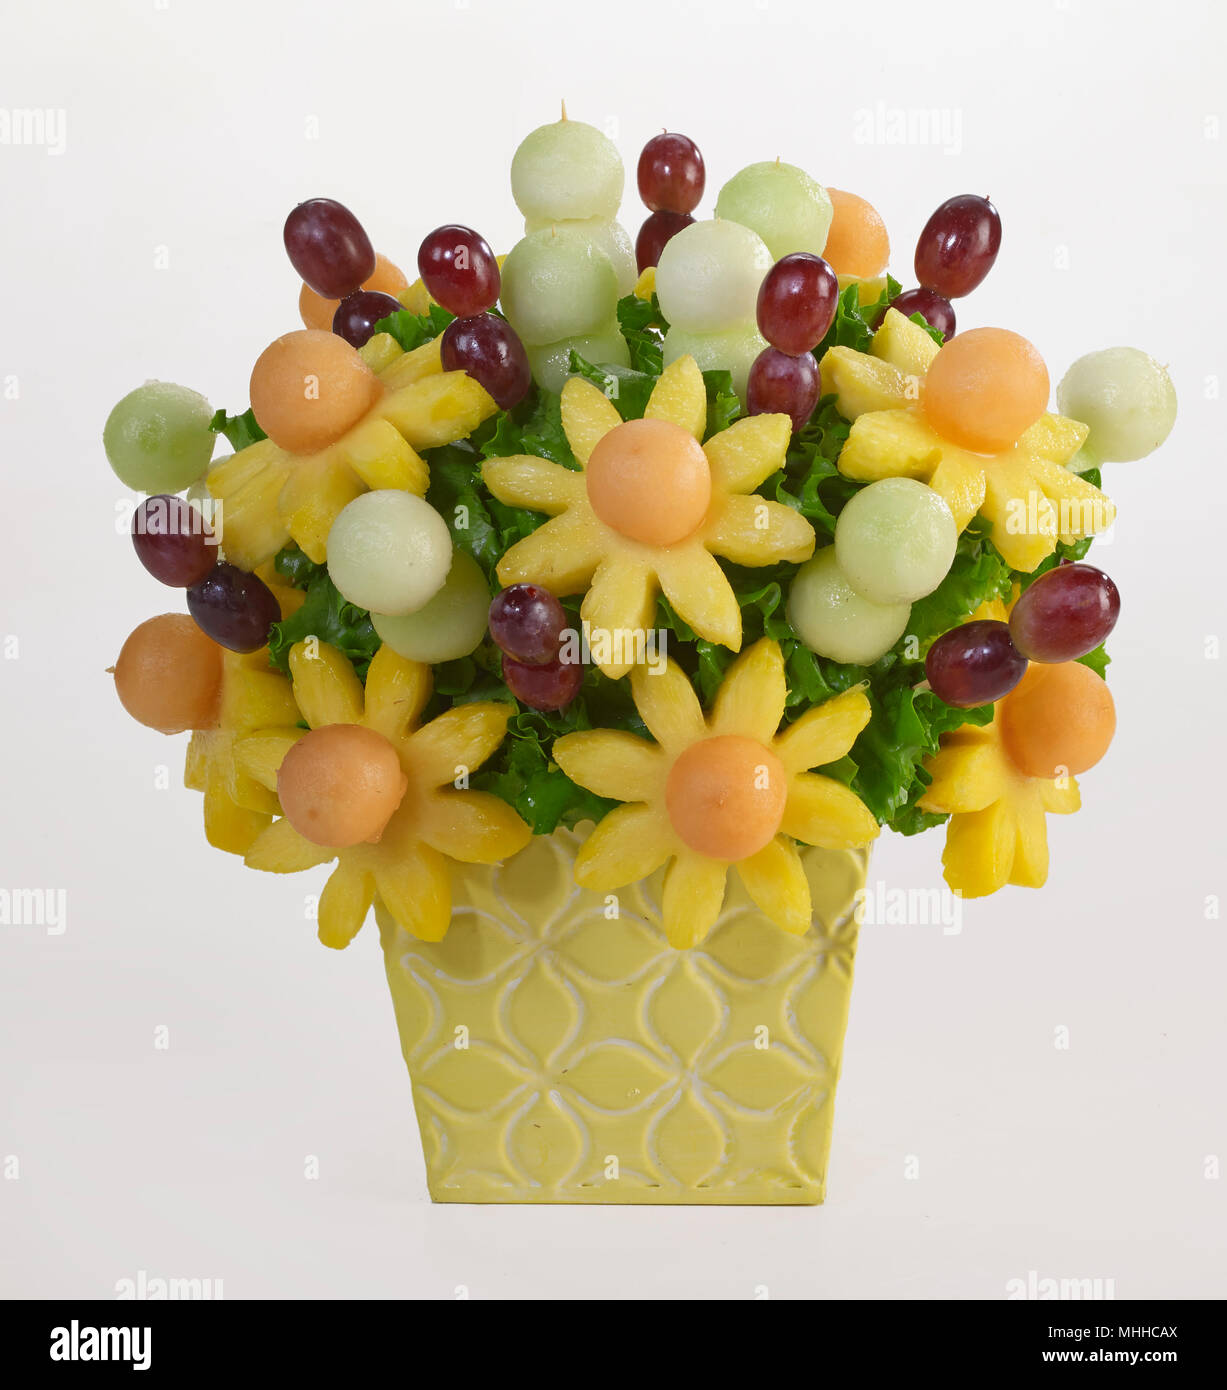 Fruit flowers bouquet stock photo 182935730 alamy fruit flowers bouquet izmirmasajfo